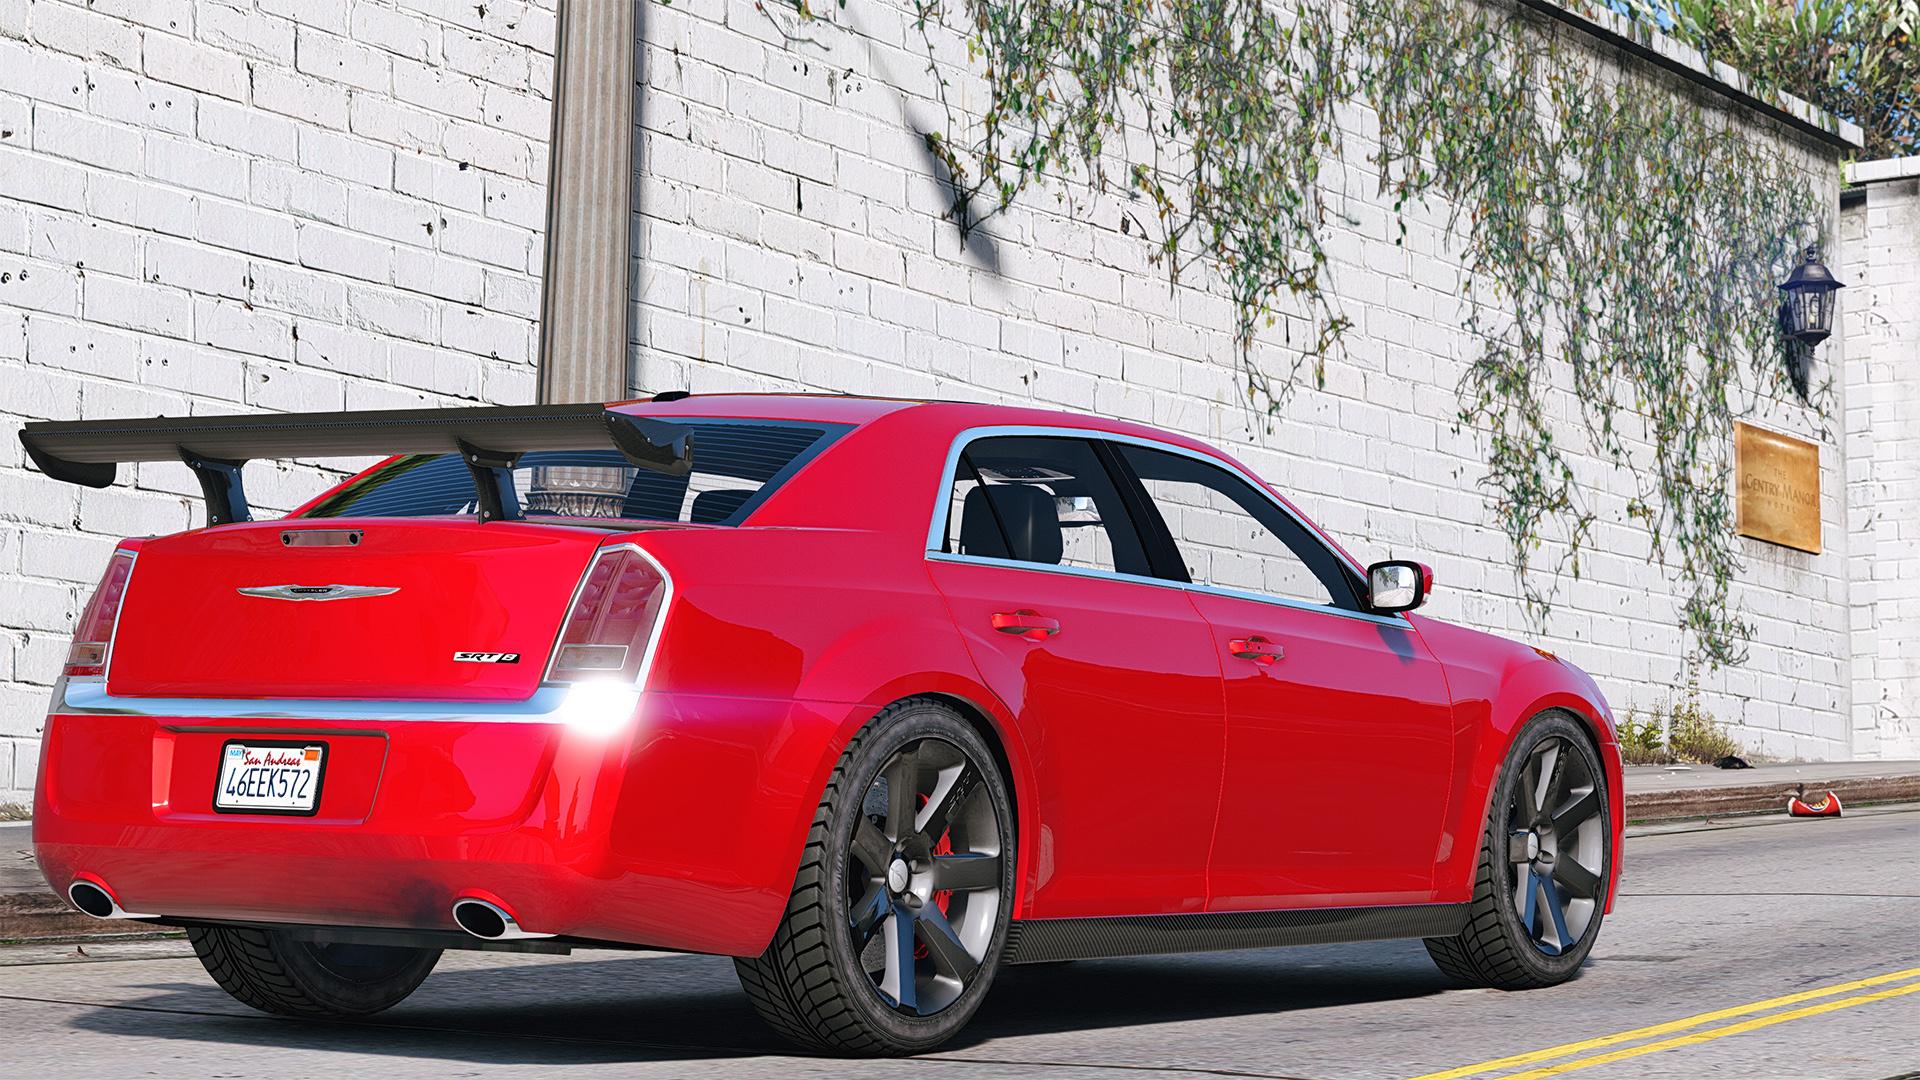 2012 Chrysler 300 Srt8 Add On Replace Tuning Gta5